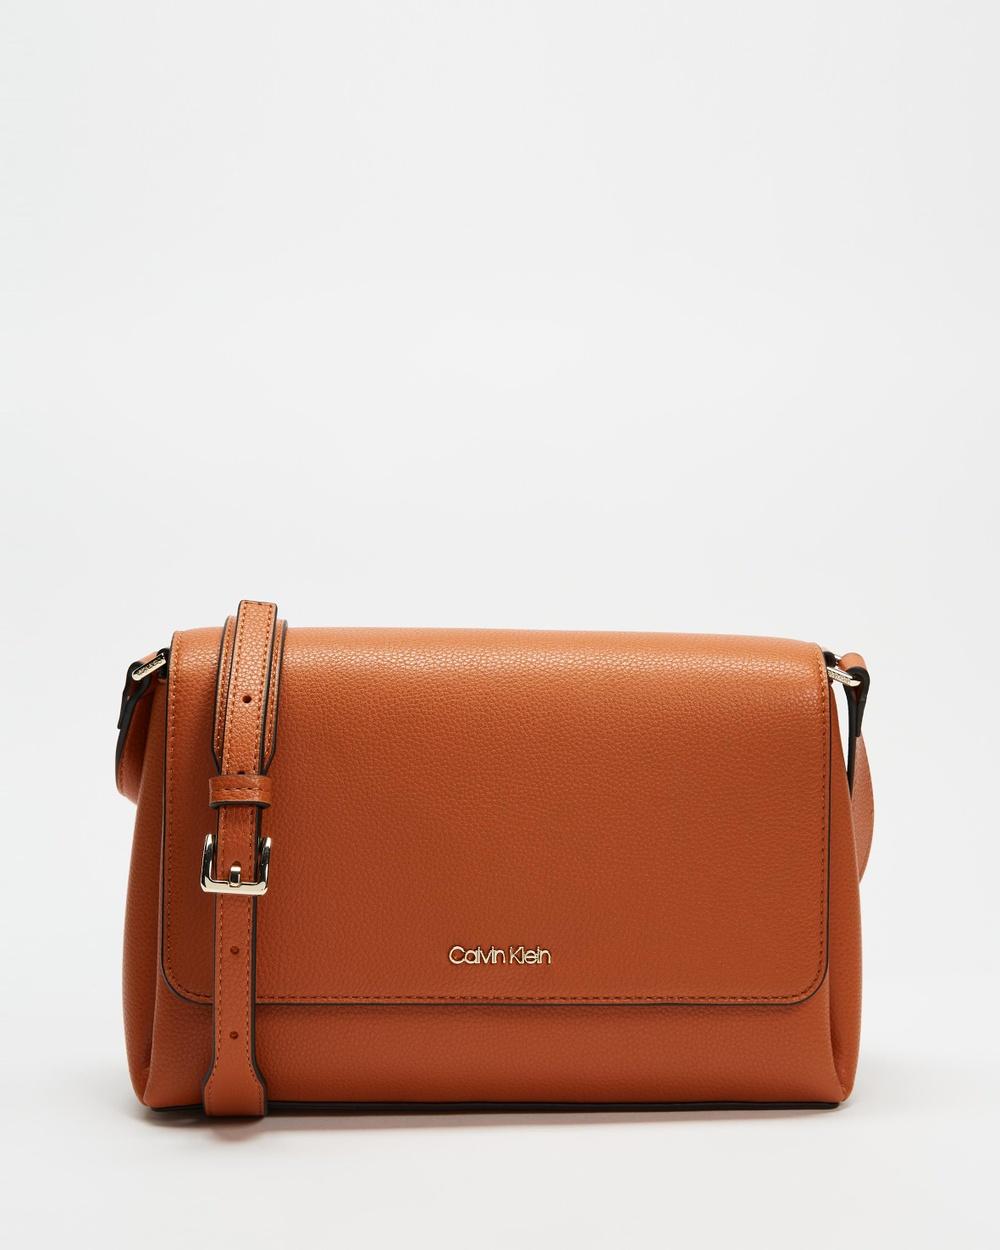 Calvin Klein Crossbody Bag Bags Cognac Cross-body bags Australia